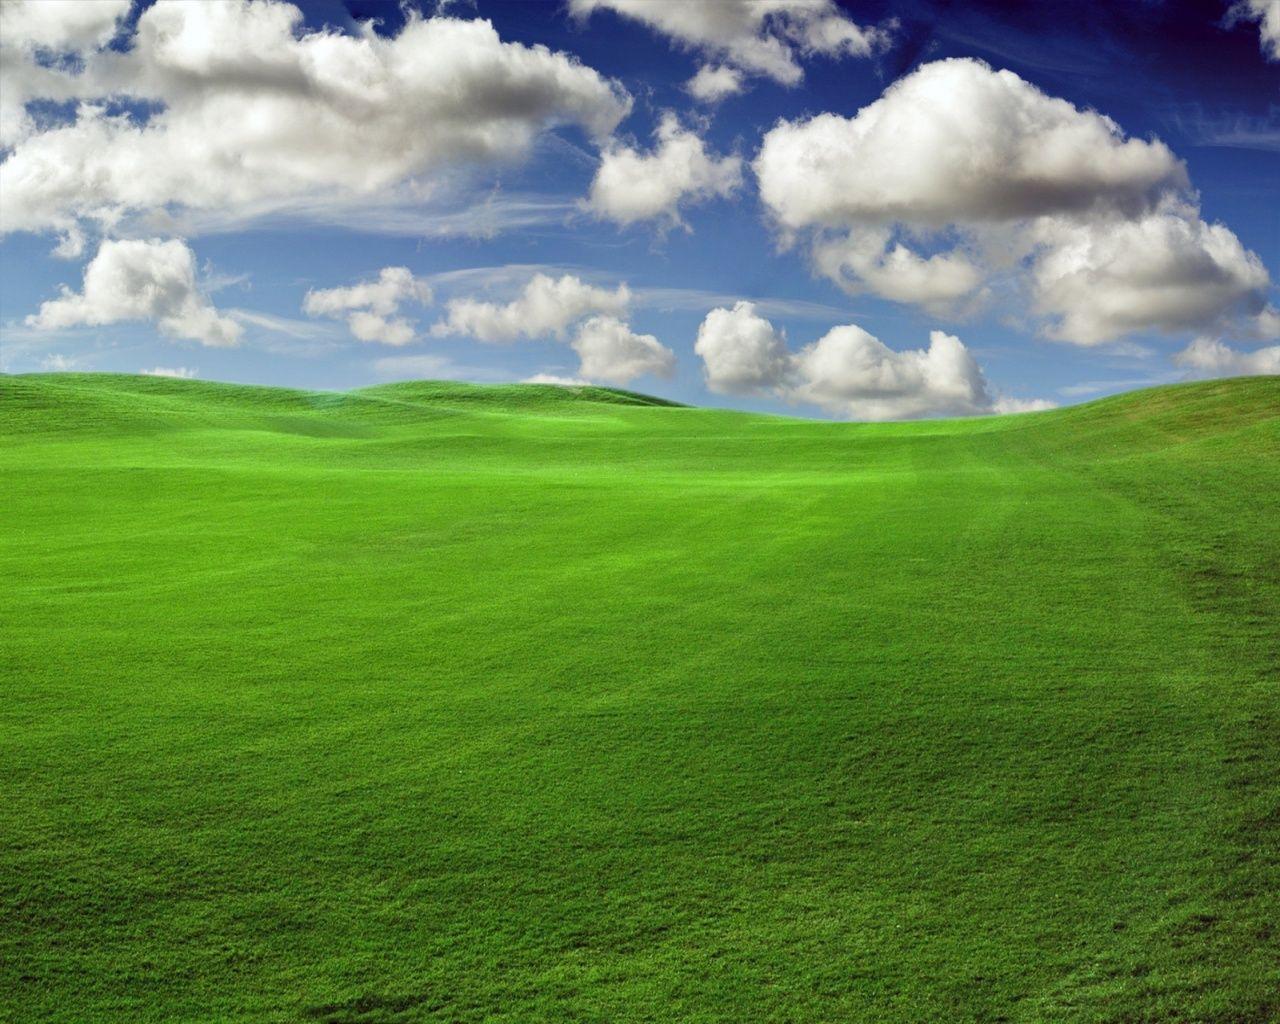 Windows XP Wallpapers HD Wallpaper 1920x1080 54